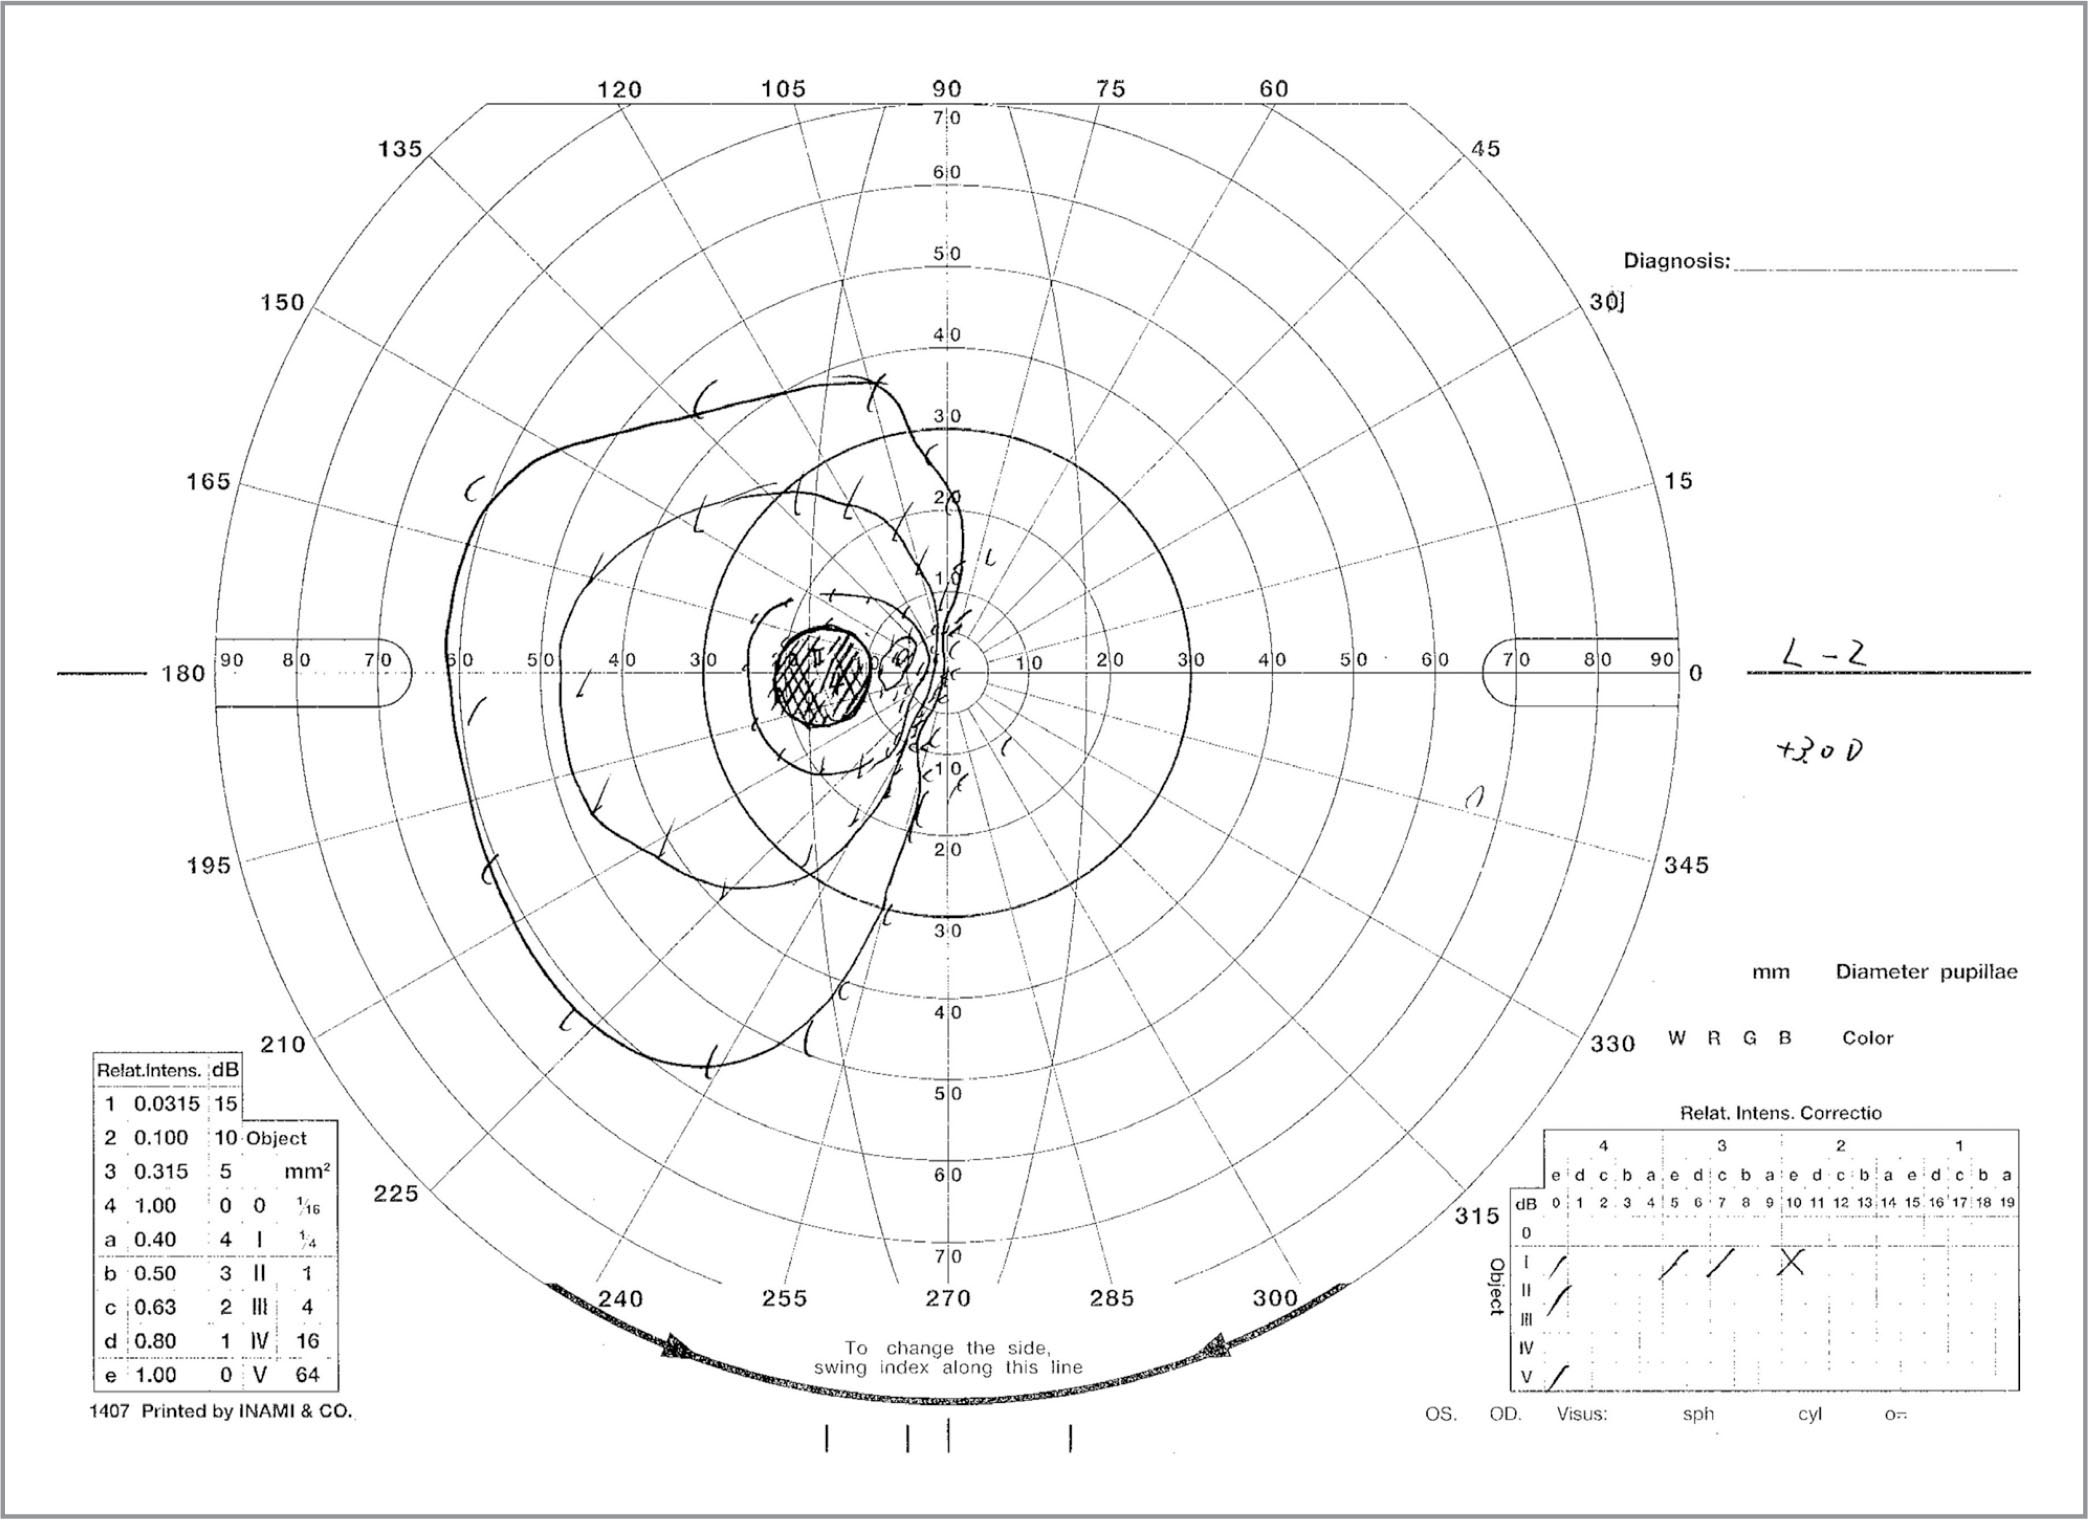 Retinal Drawing at GetDrawings com | Free for personal use Retinal